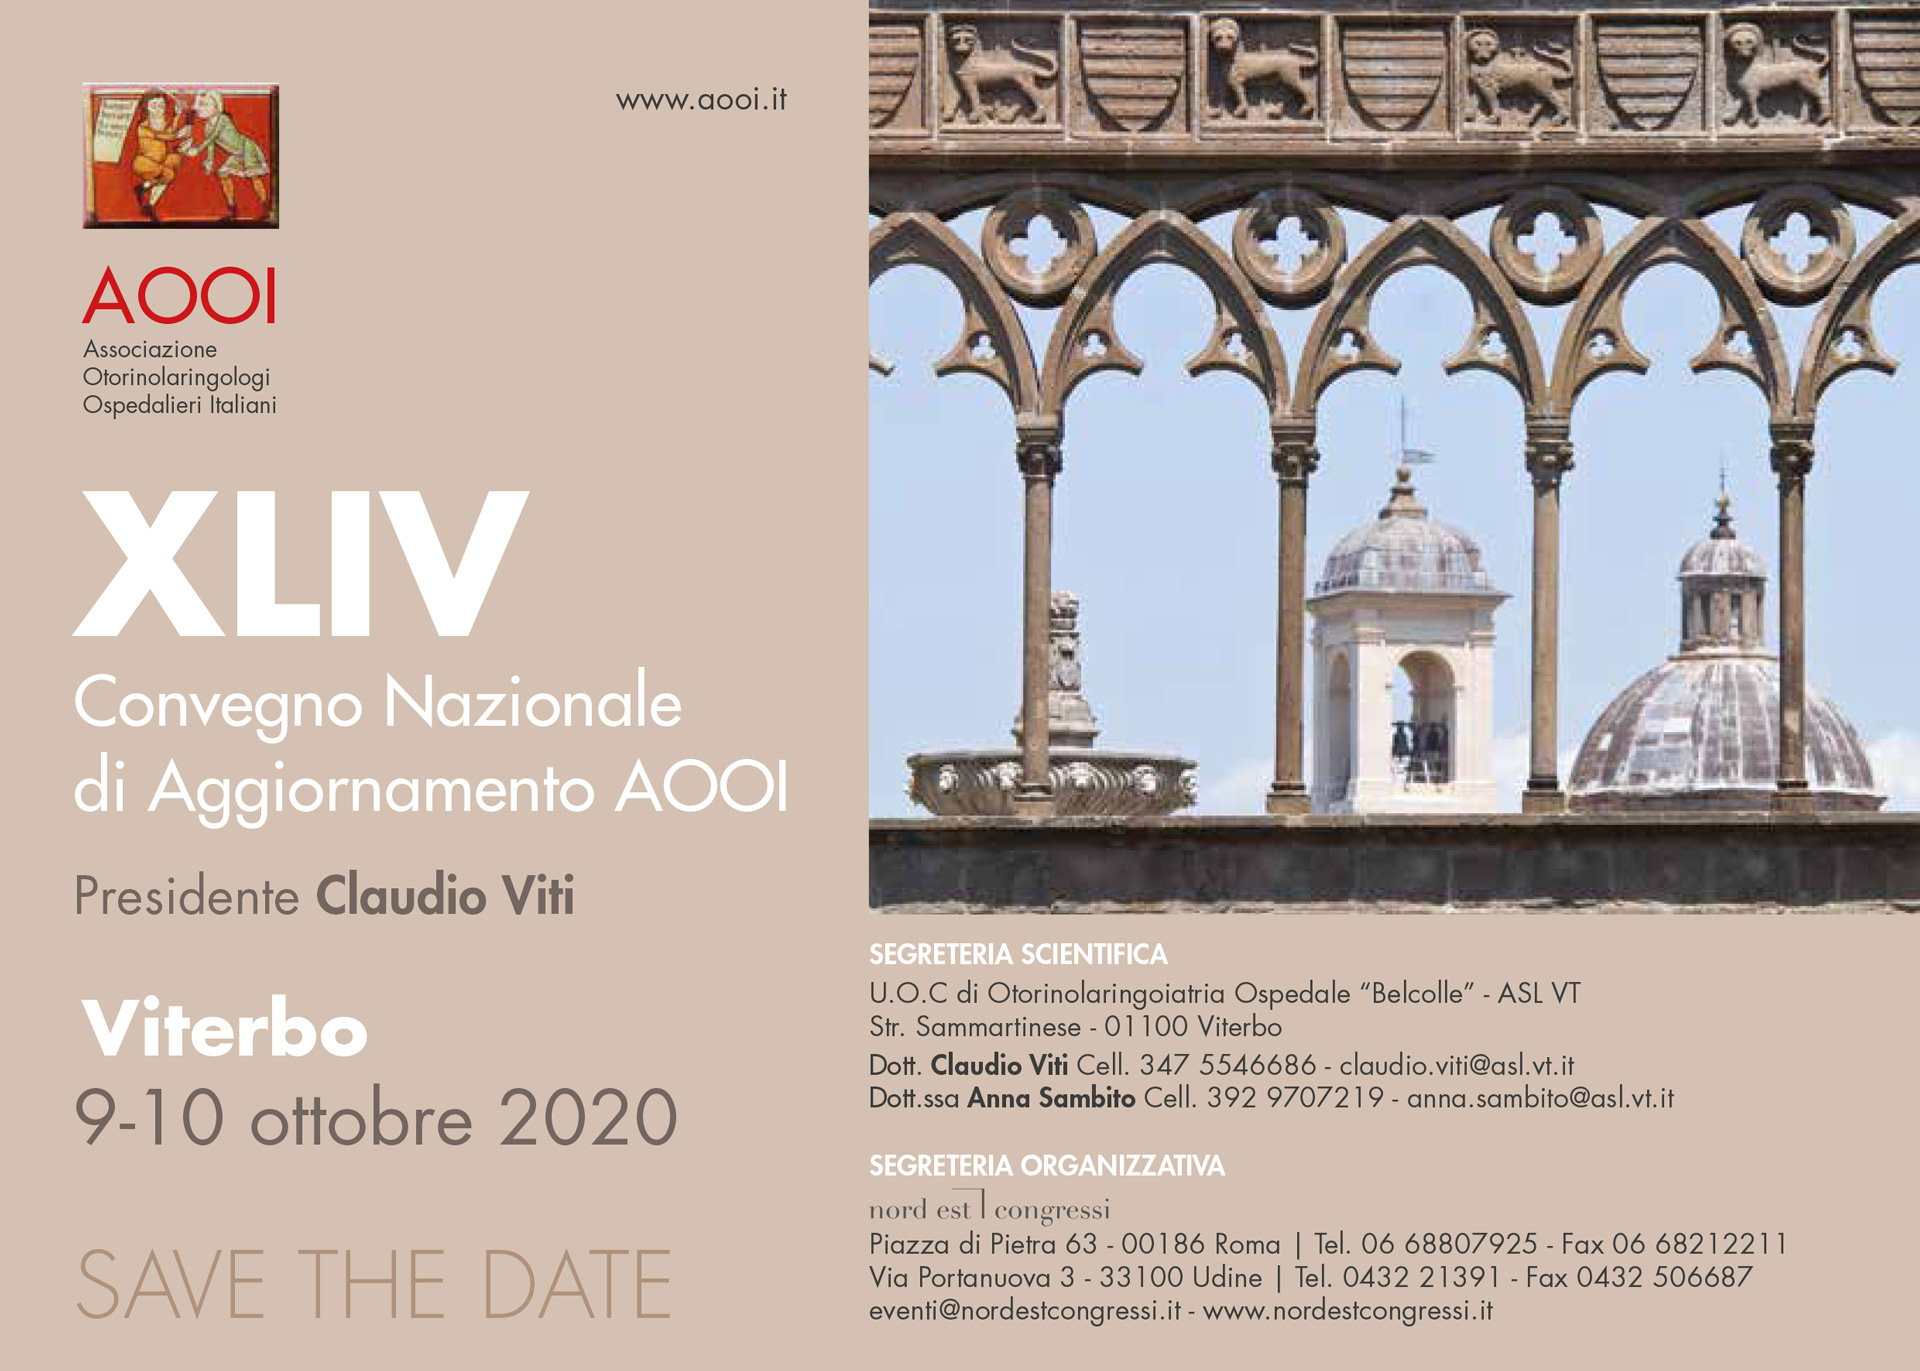 SAVE-THE-DATE-locandina-AOOI-nazionale-Viterbo-2020